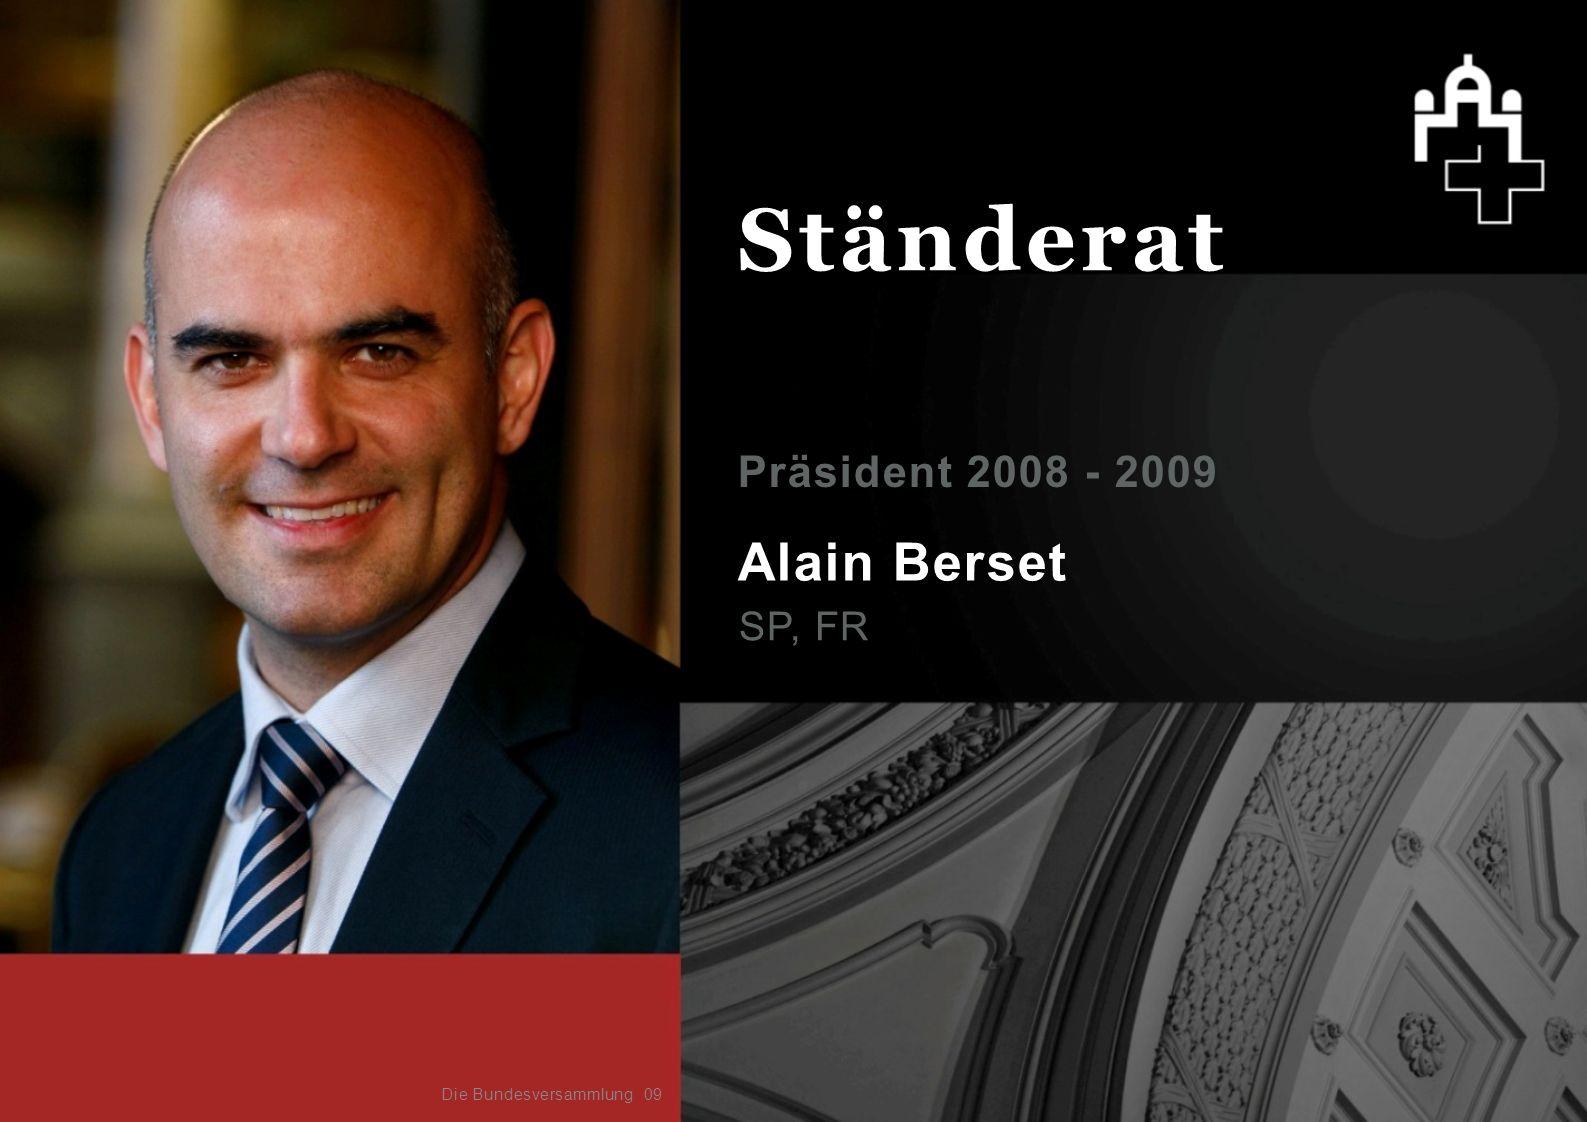 Ständerat Alain Berset Präsident 2008 - 2009 SP, FR